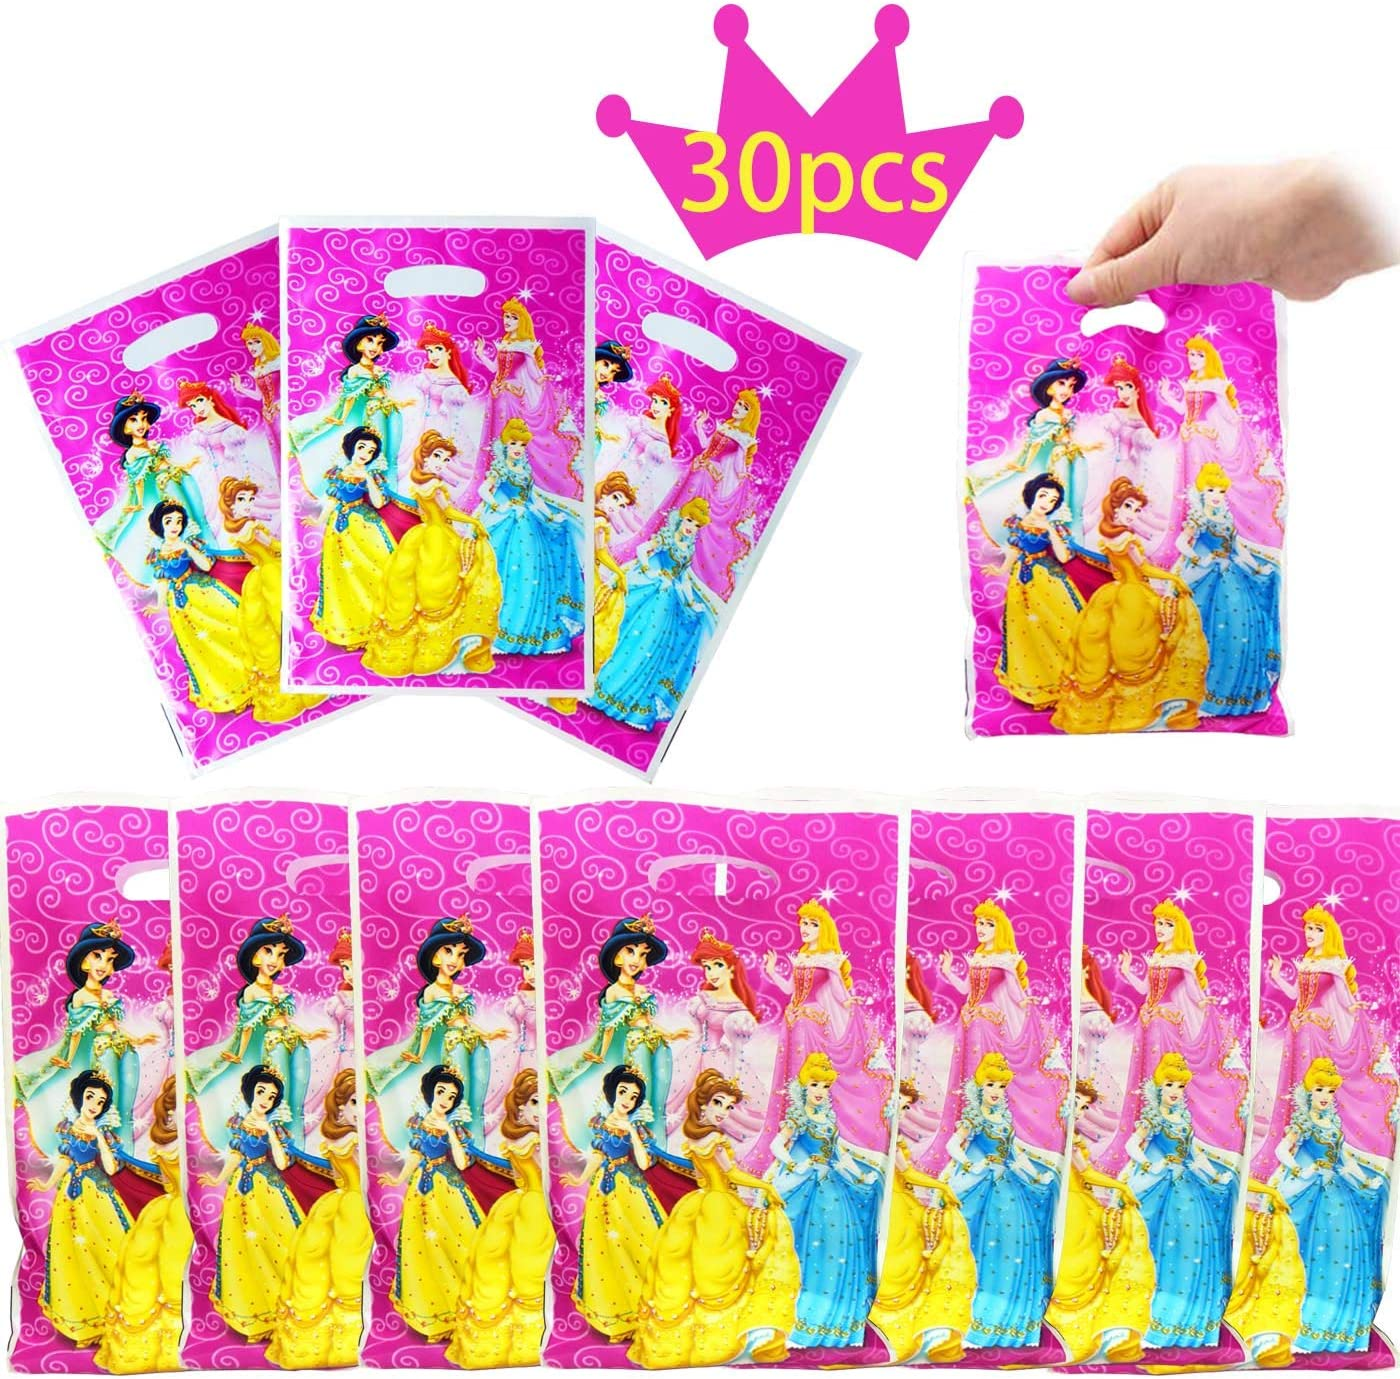 Princess Stickers x 6 Disney Princess Party Bag /& Loot Ideas Birthday Supplies